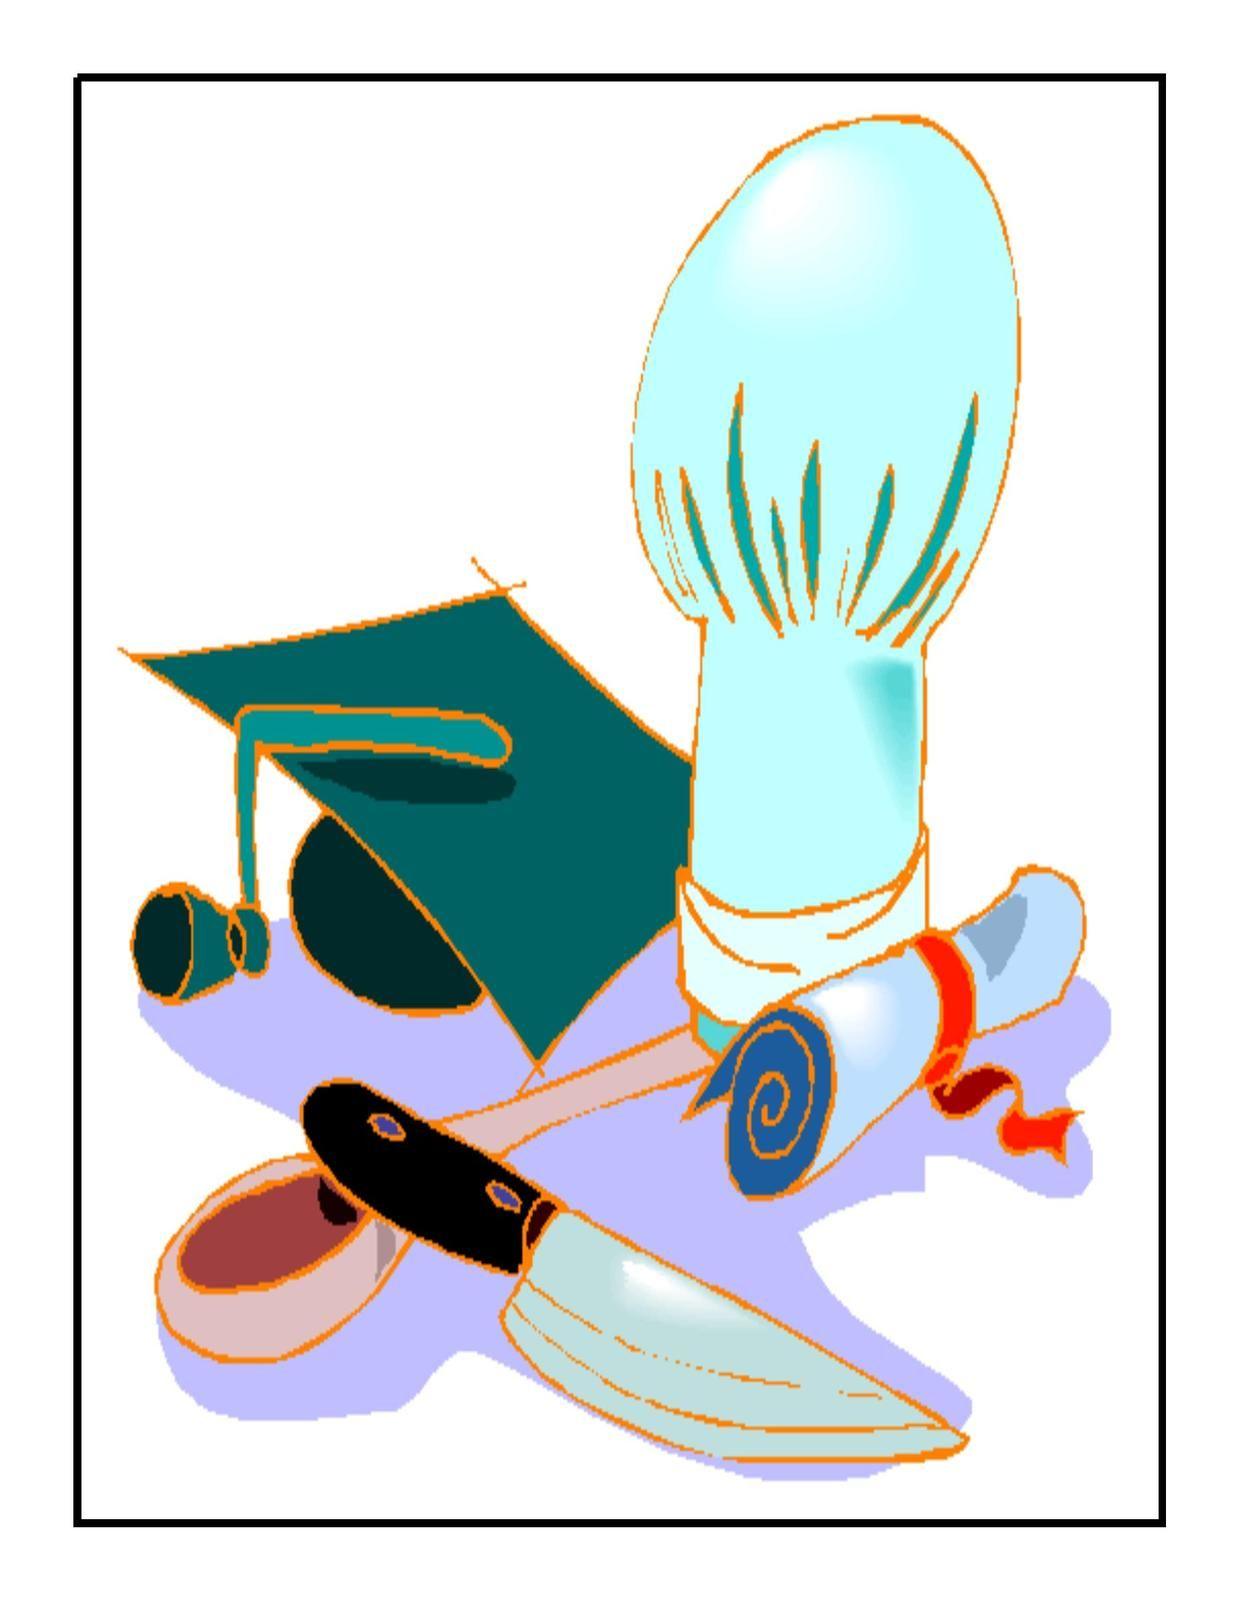 graduate culinary art digital download clipart artclip digital culinaryarts graduation [ 1236 x 1600 Pixel ]